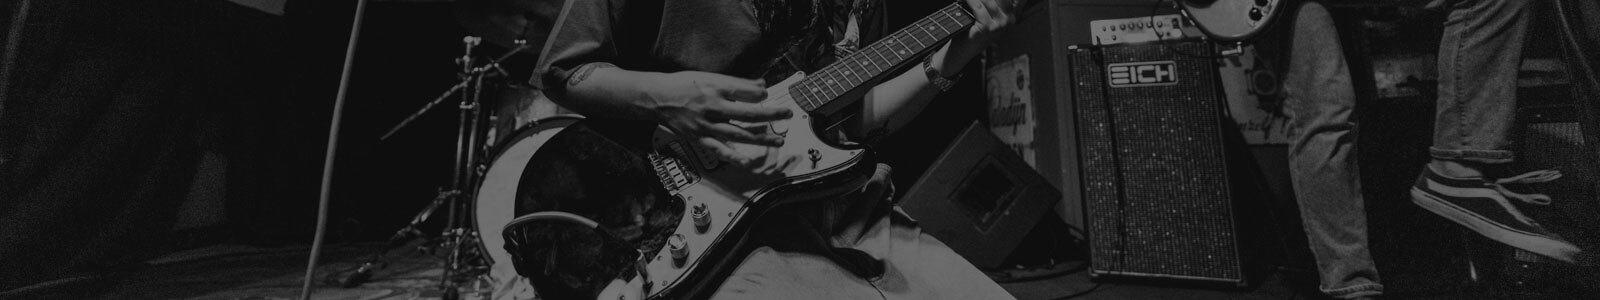 Eich Amplification Live Performance Guitar